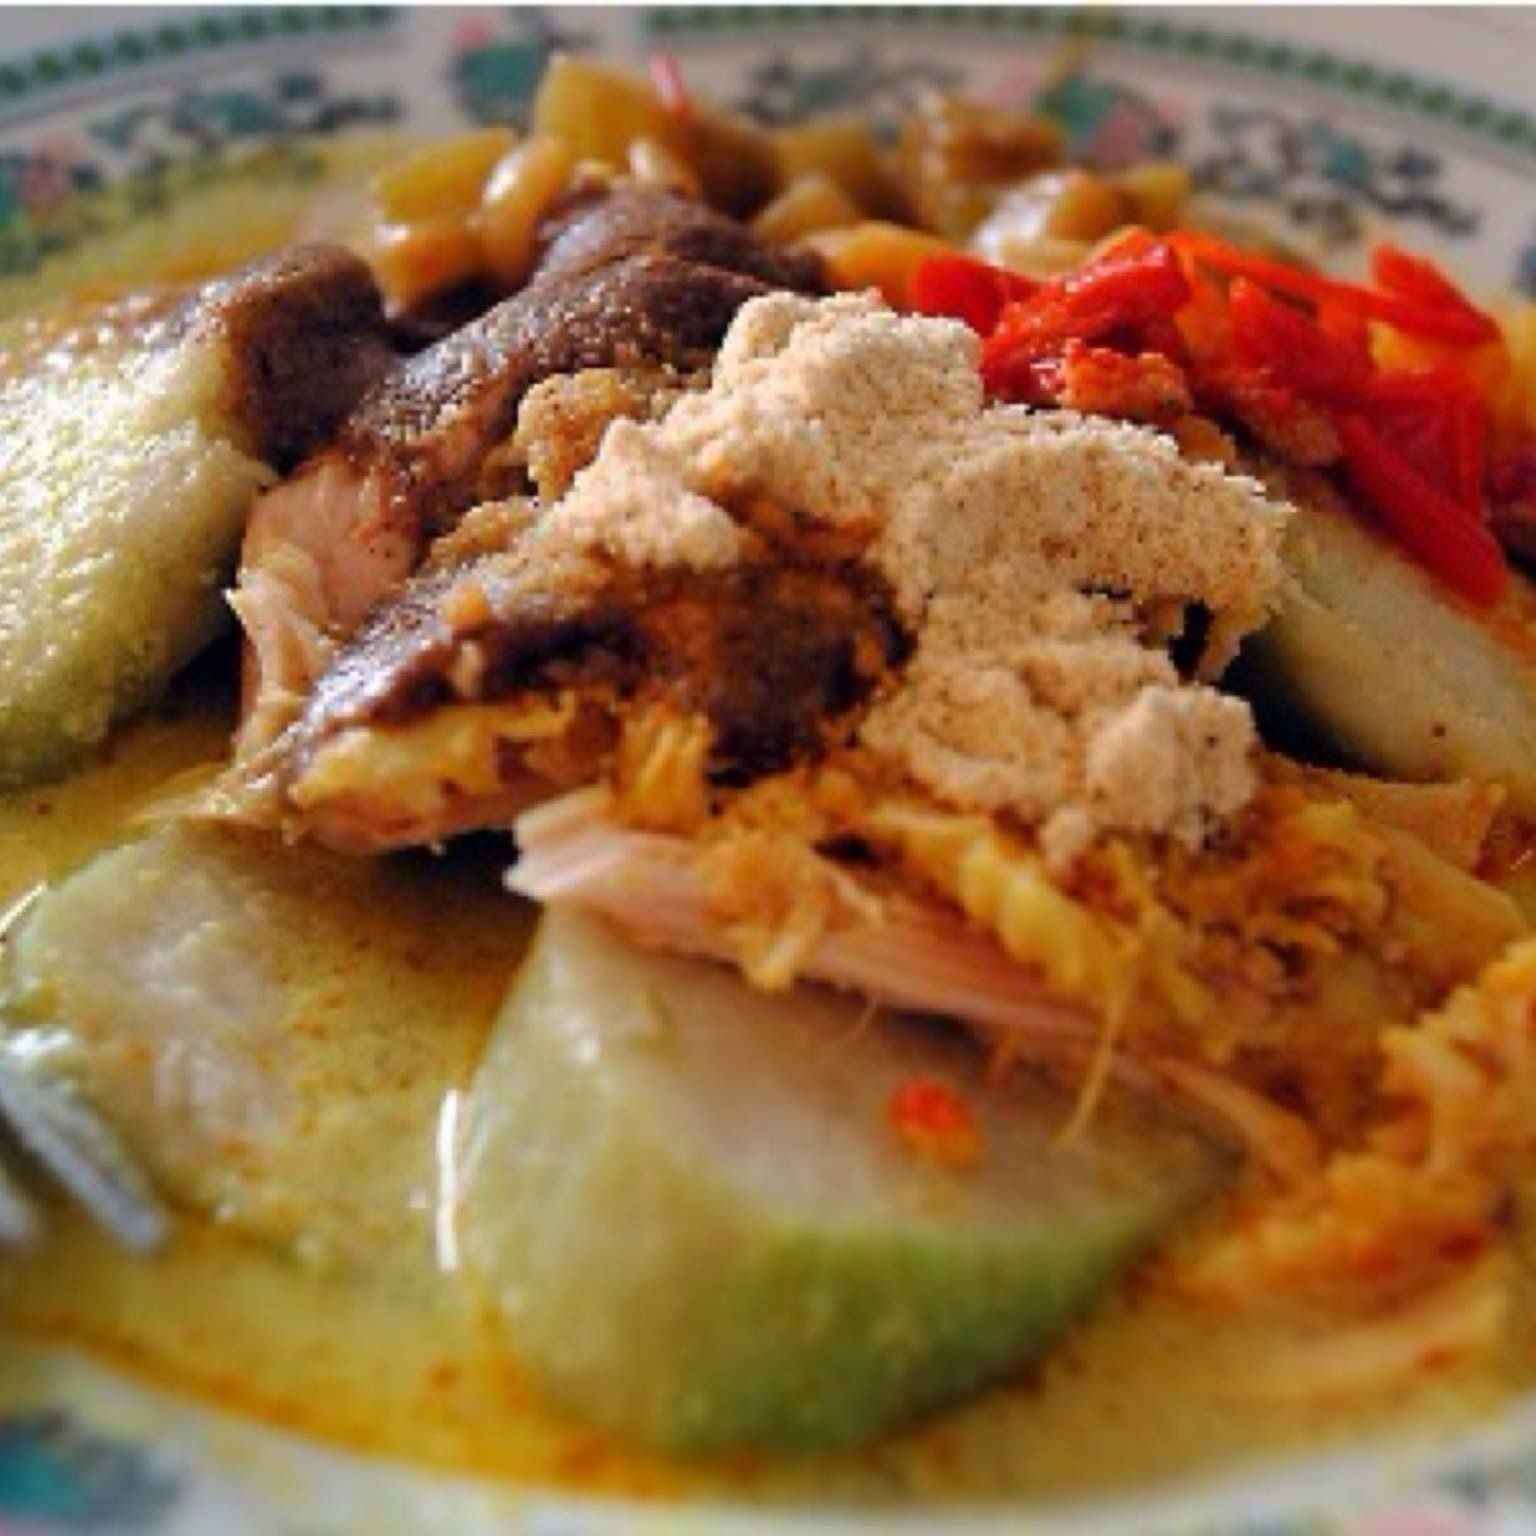 The Famous Lontong Cap Gomeh Lontong Sayur Godok Opor Ayam Suwir Telor Pindang Sambal Merah Makan Malam Masakan Masakan Indonesia